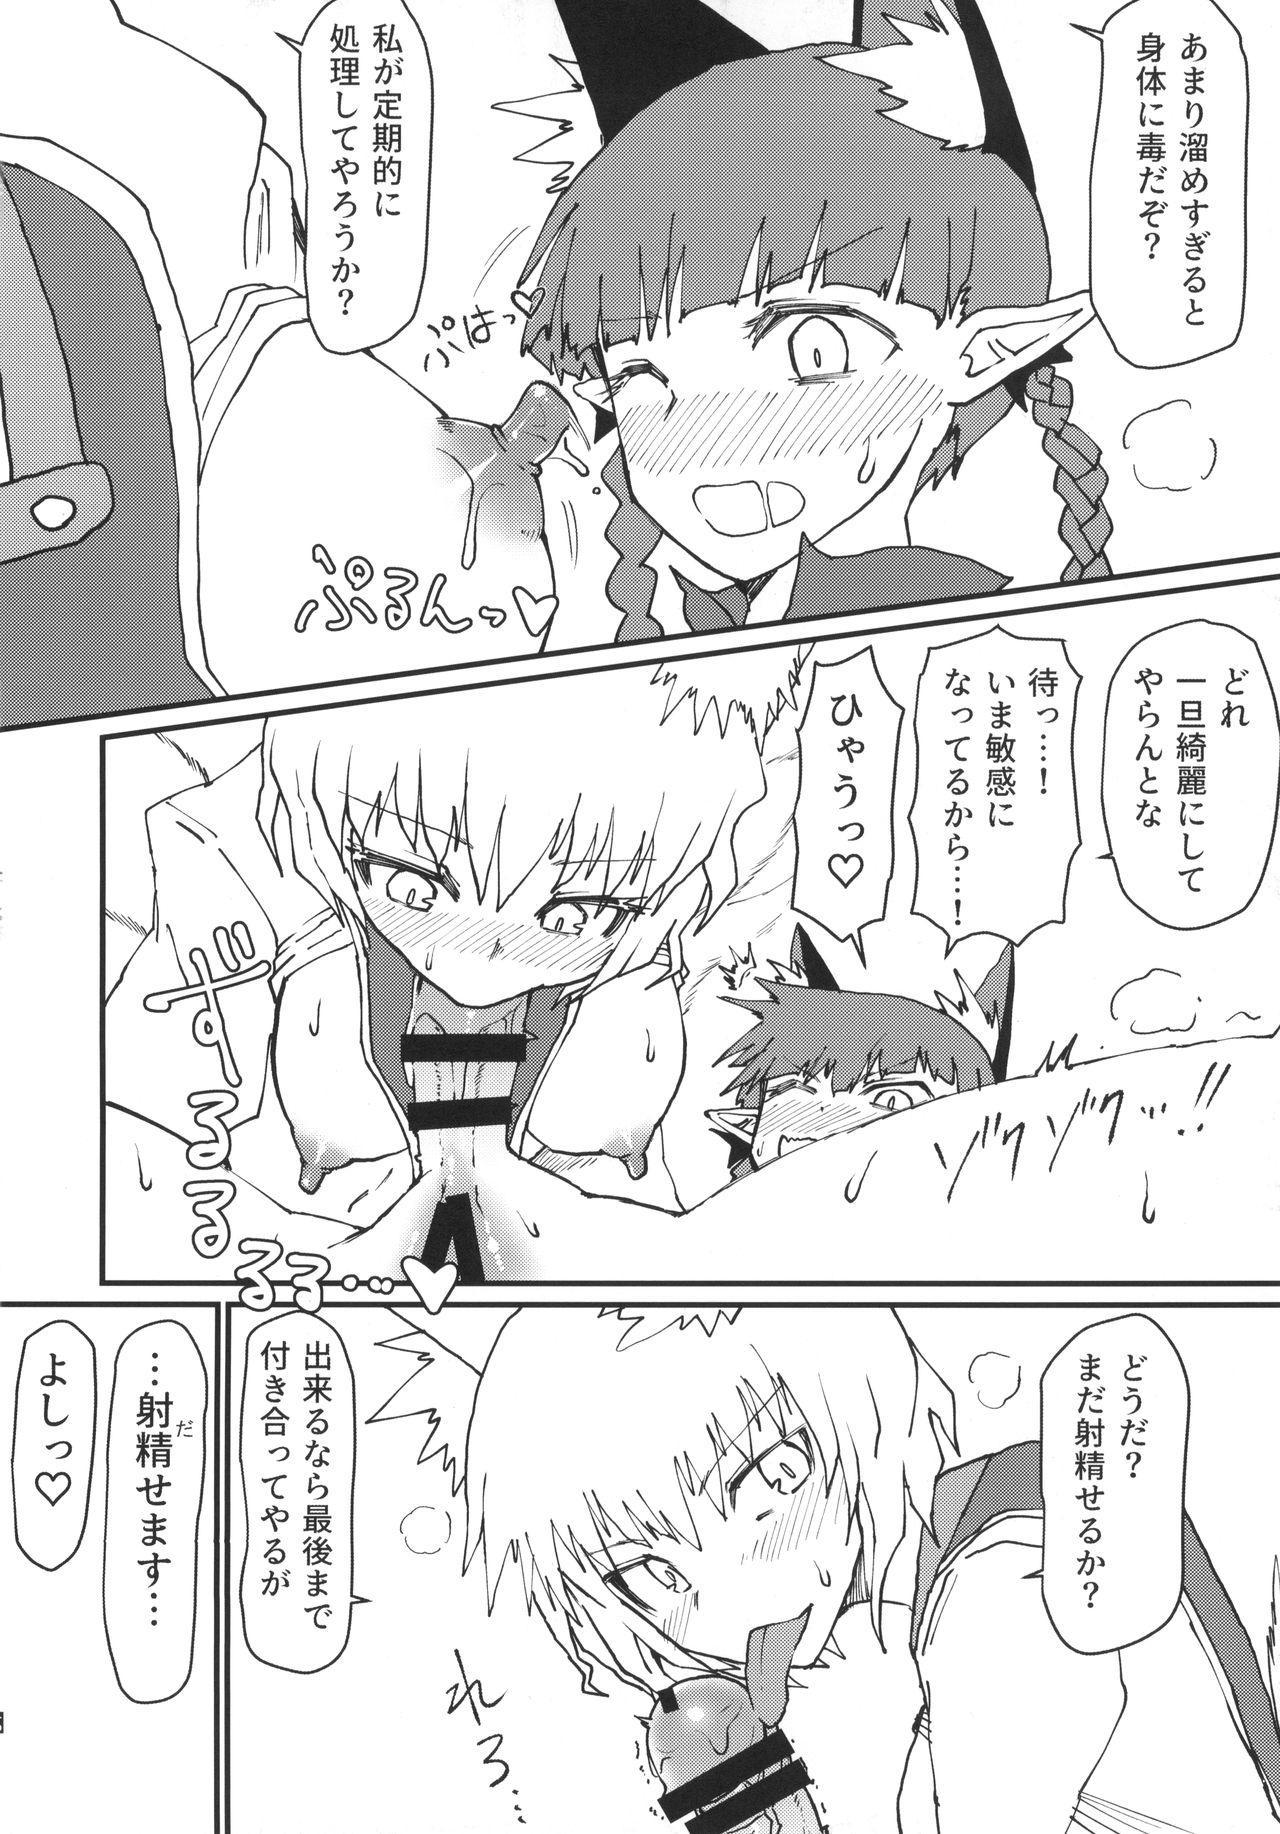 Orin-chan o Tappuri Amae Sasete Takusan Shasei Sasete Ageru Hon. 10